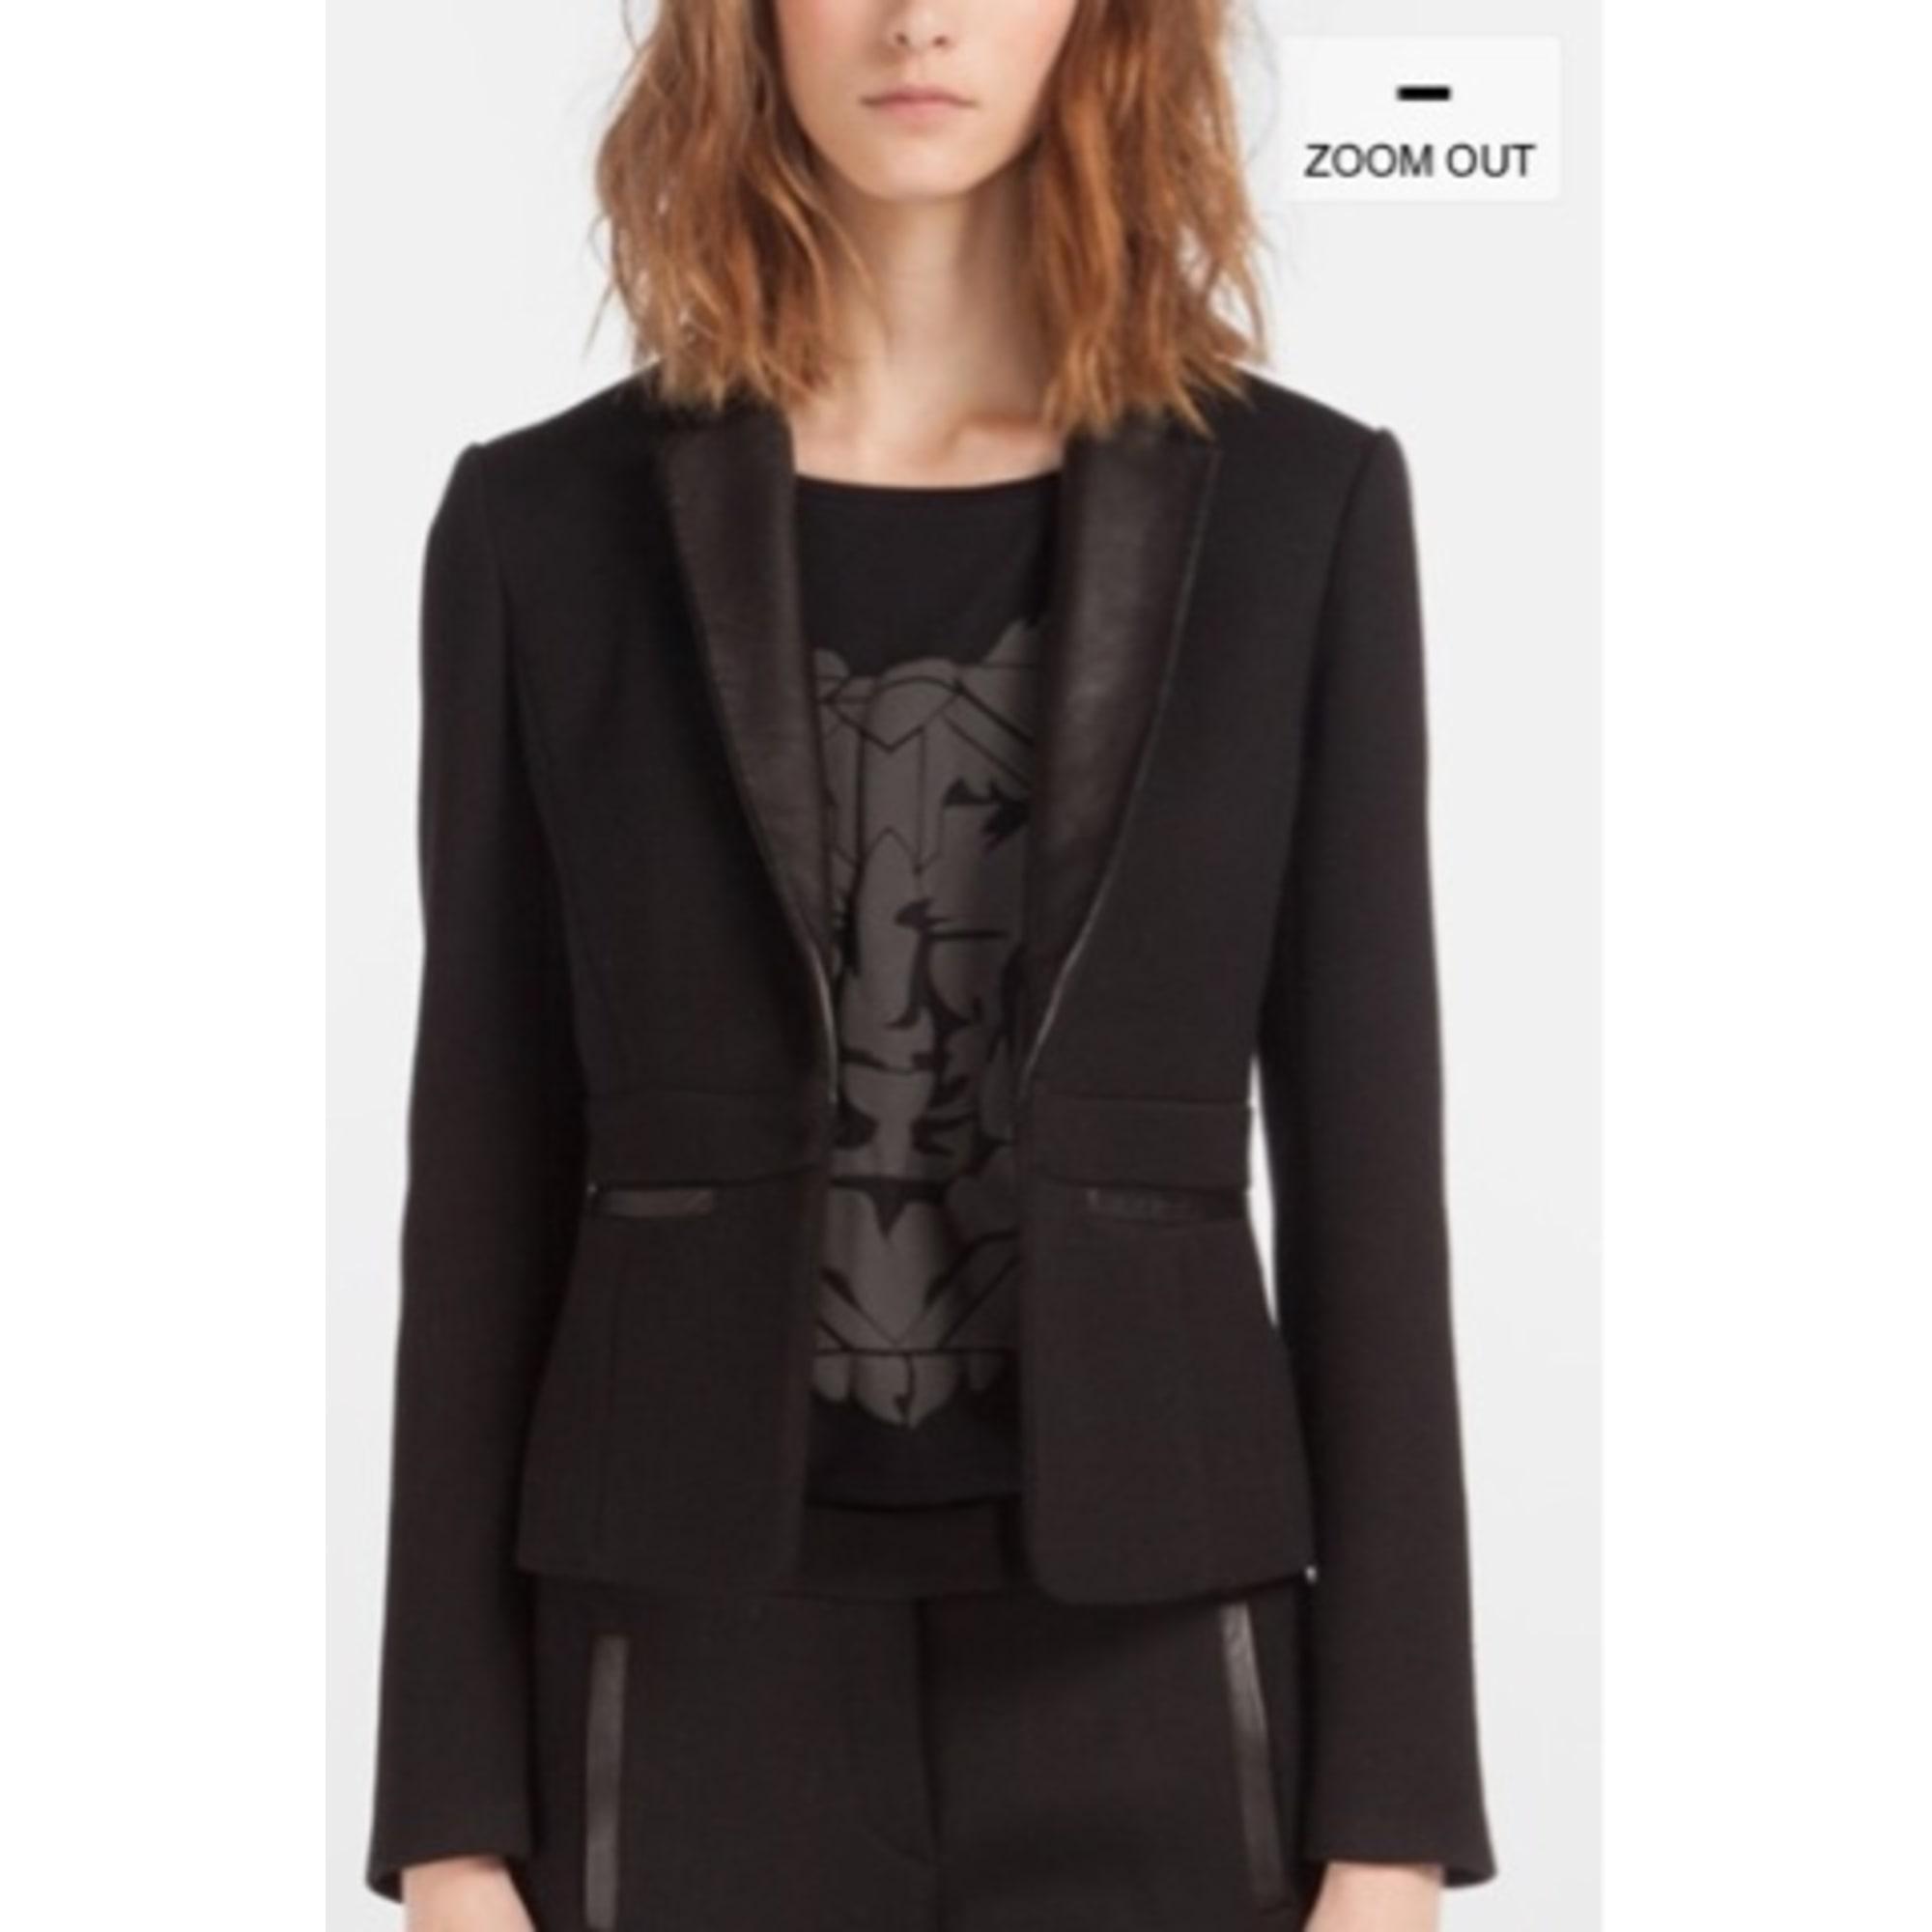 Blazer, veste tailleur MAJE 38 (M, T2) noir vendu par Sarah ... f6206af6ec08